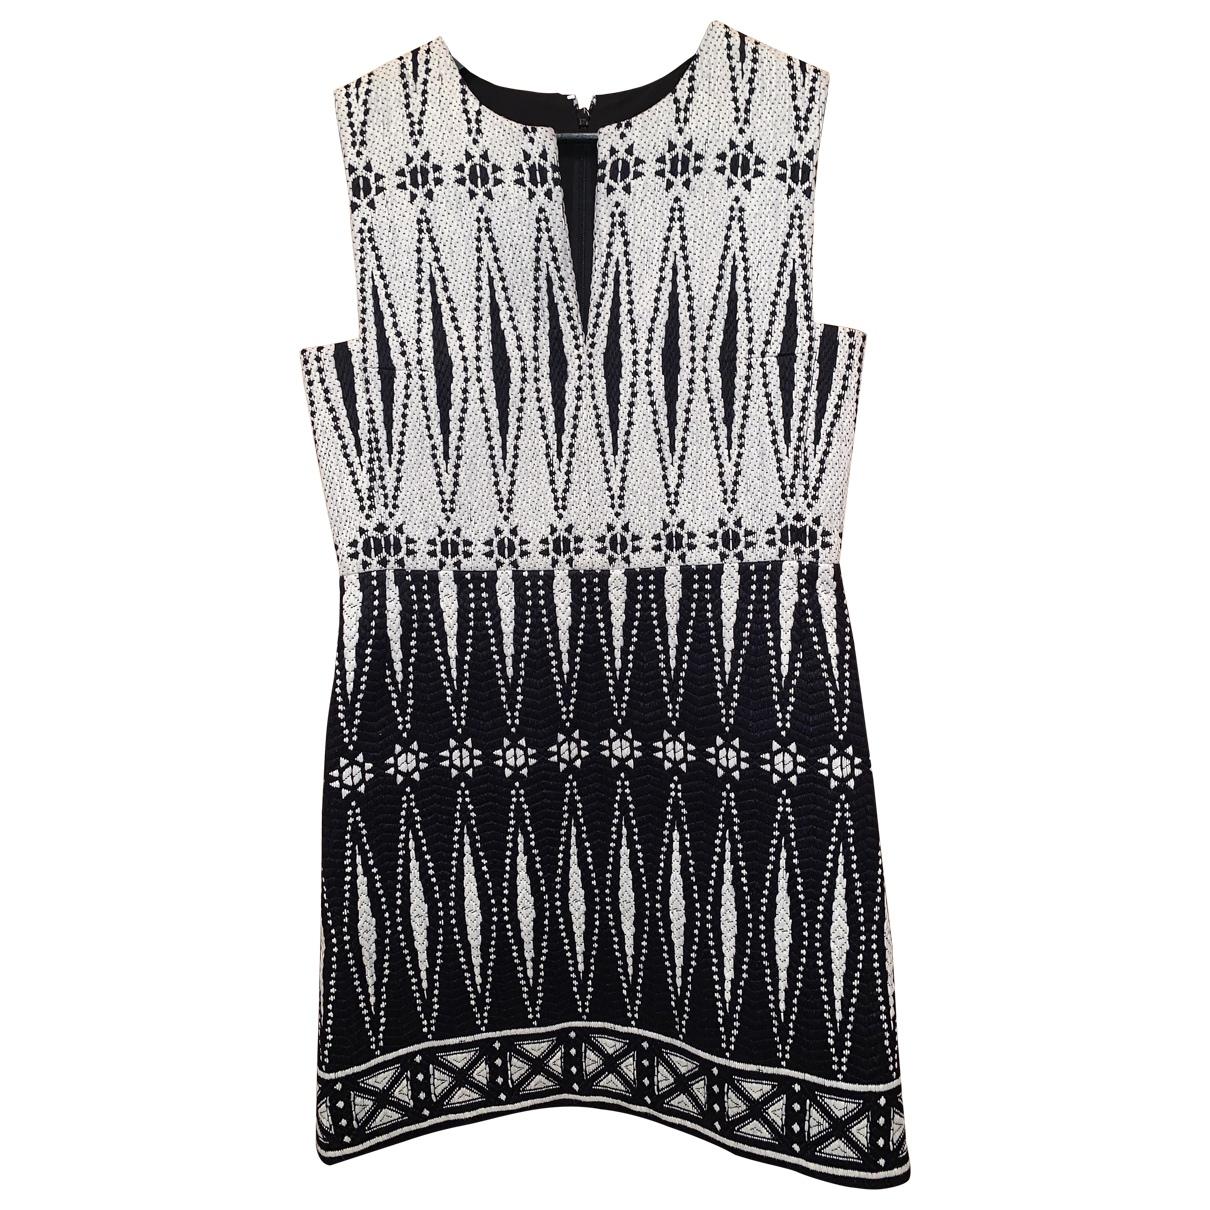 Tory Burch \N Kleid in  Schwarz Polyester